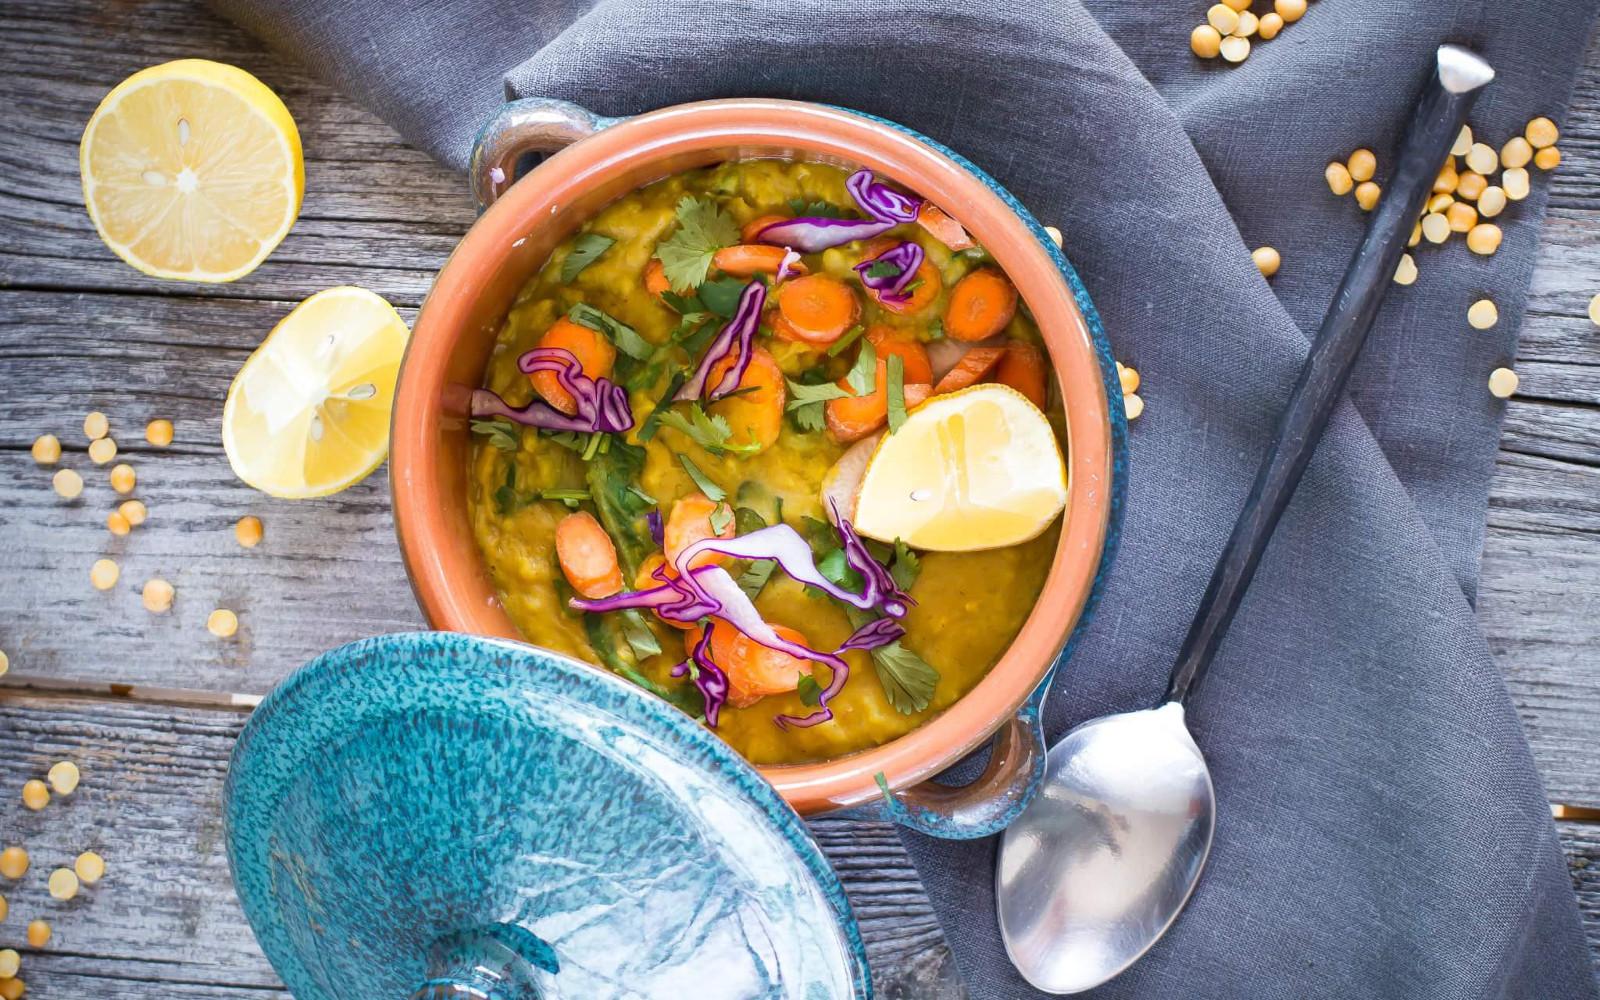 Vegan Gluten-Free instant pot green kichari with carrots, lemons, and purple cabbage